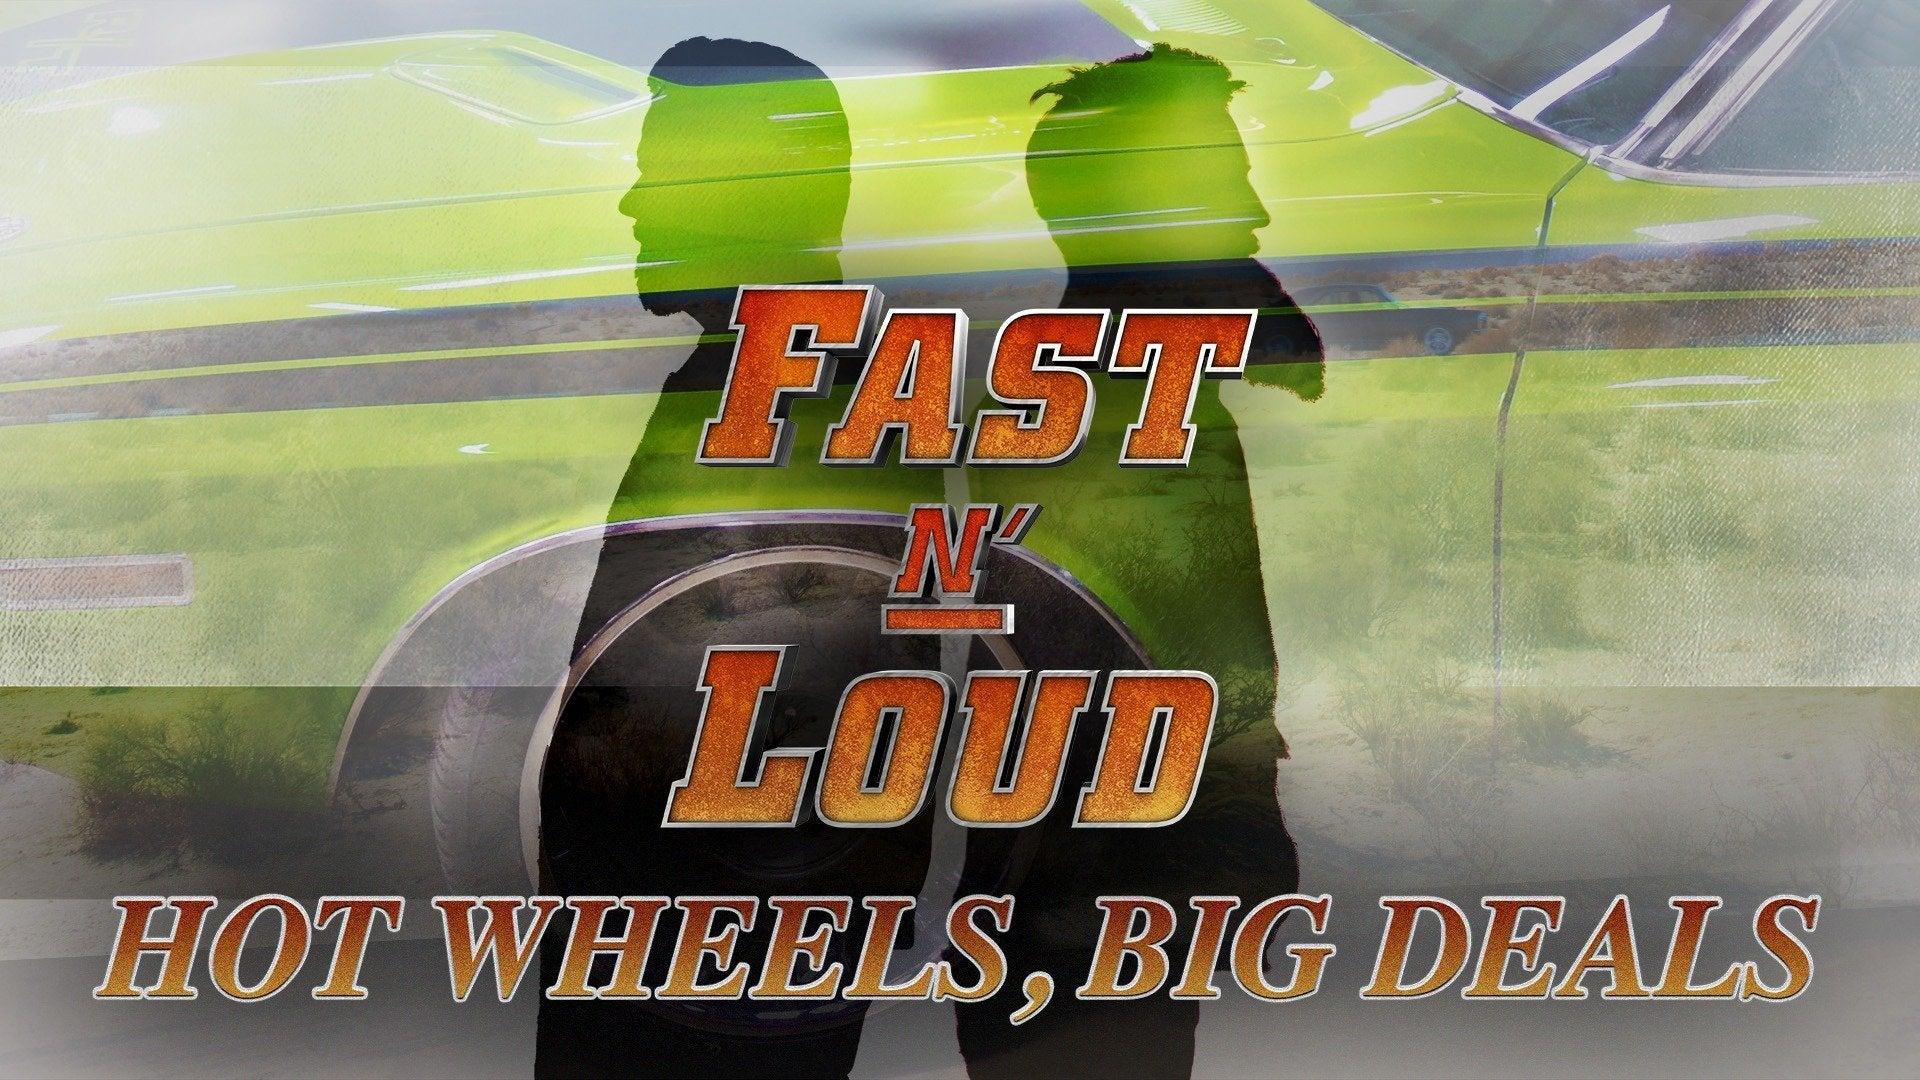 Fast N' Loud: Hot Wheels, Big Deals